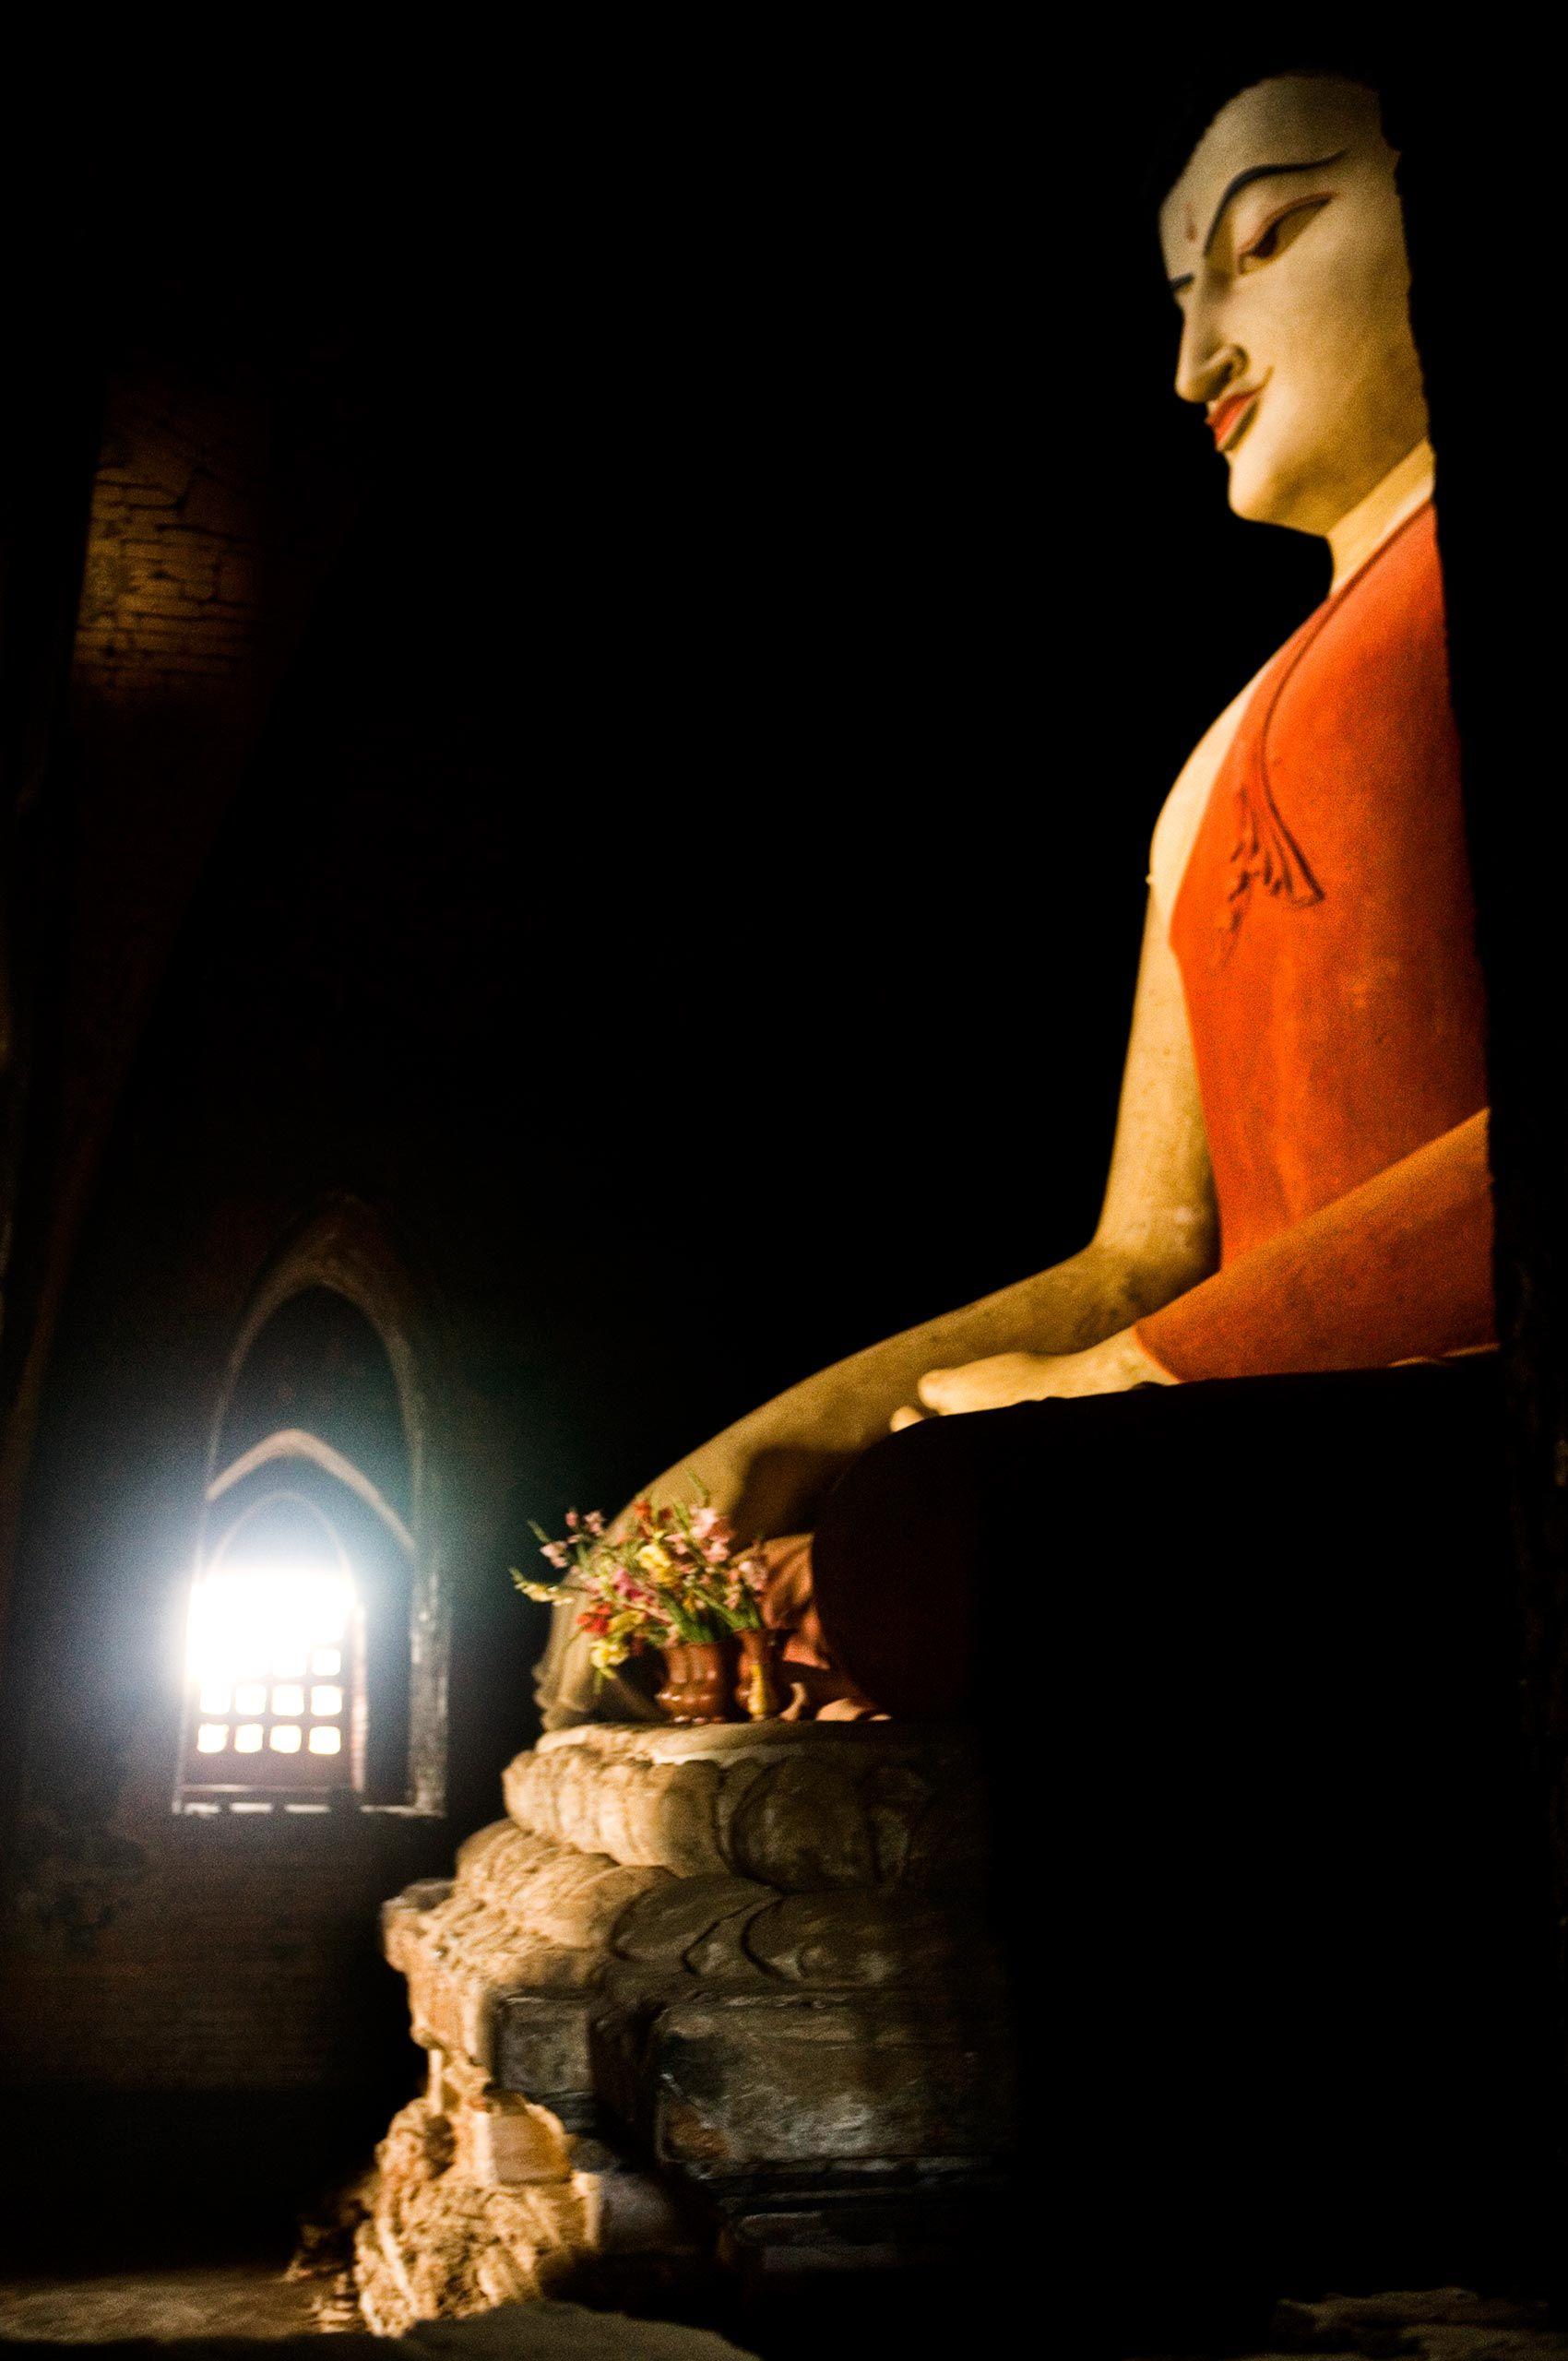 bagan-buddha-myanmar-HenrikOlundPhotography.jpg